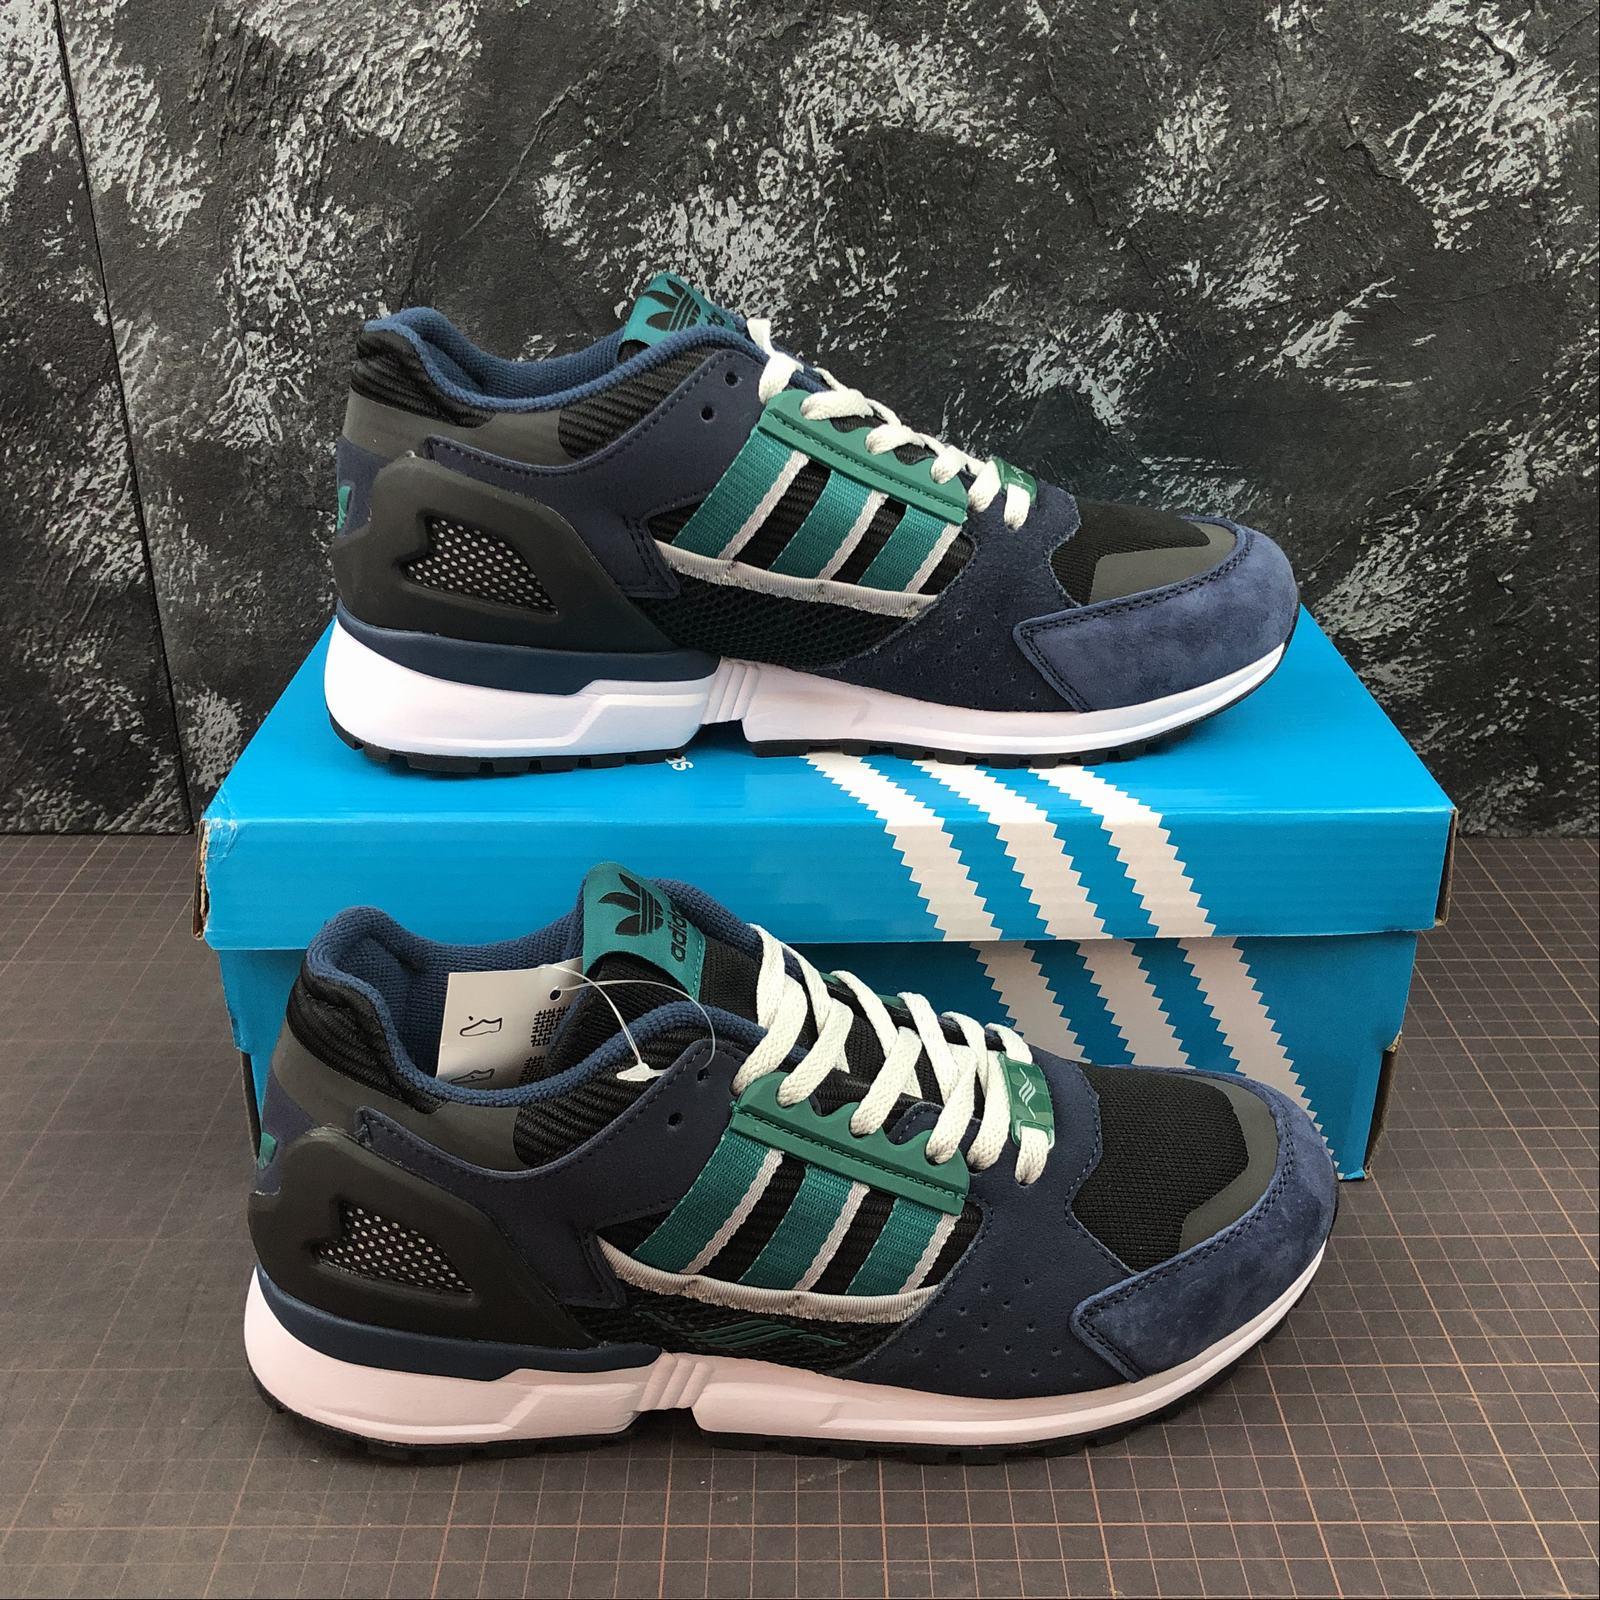 giay-sneaker-adidas-zx10000-c-ee9488